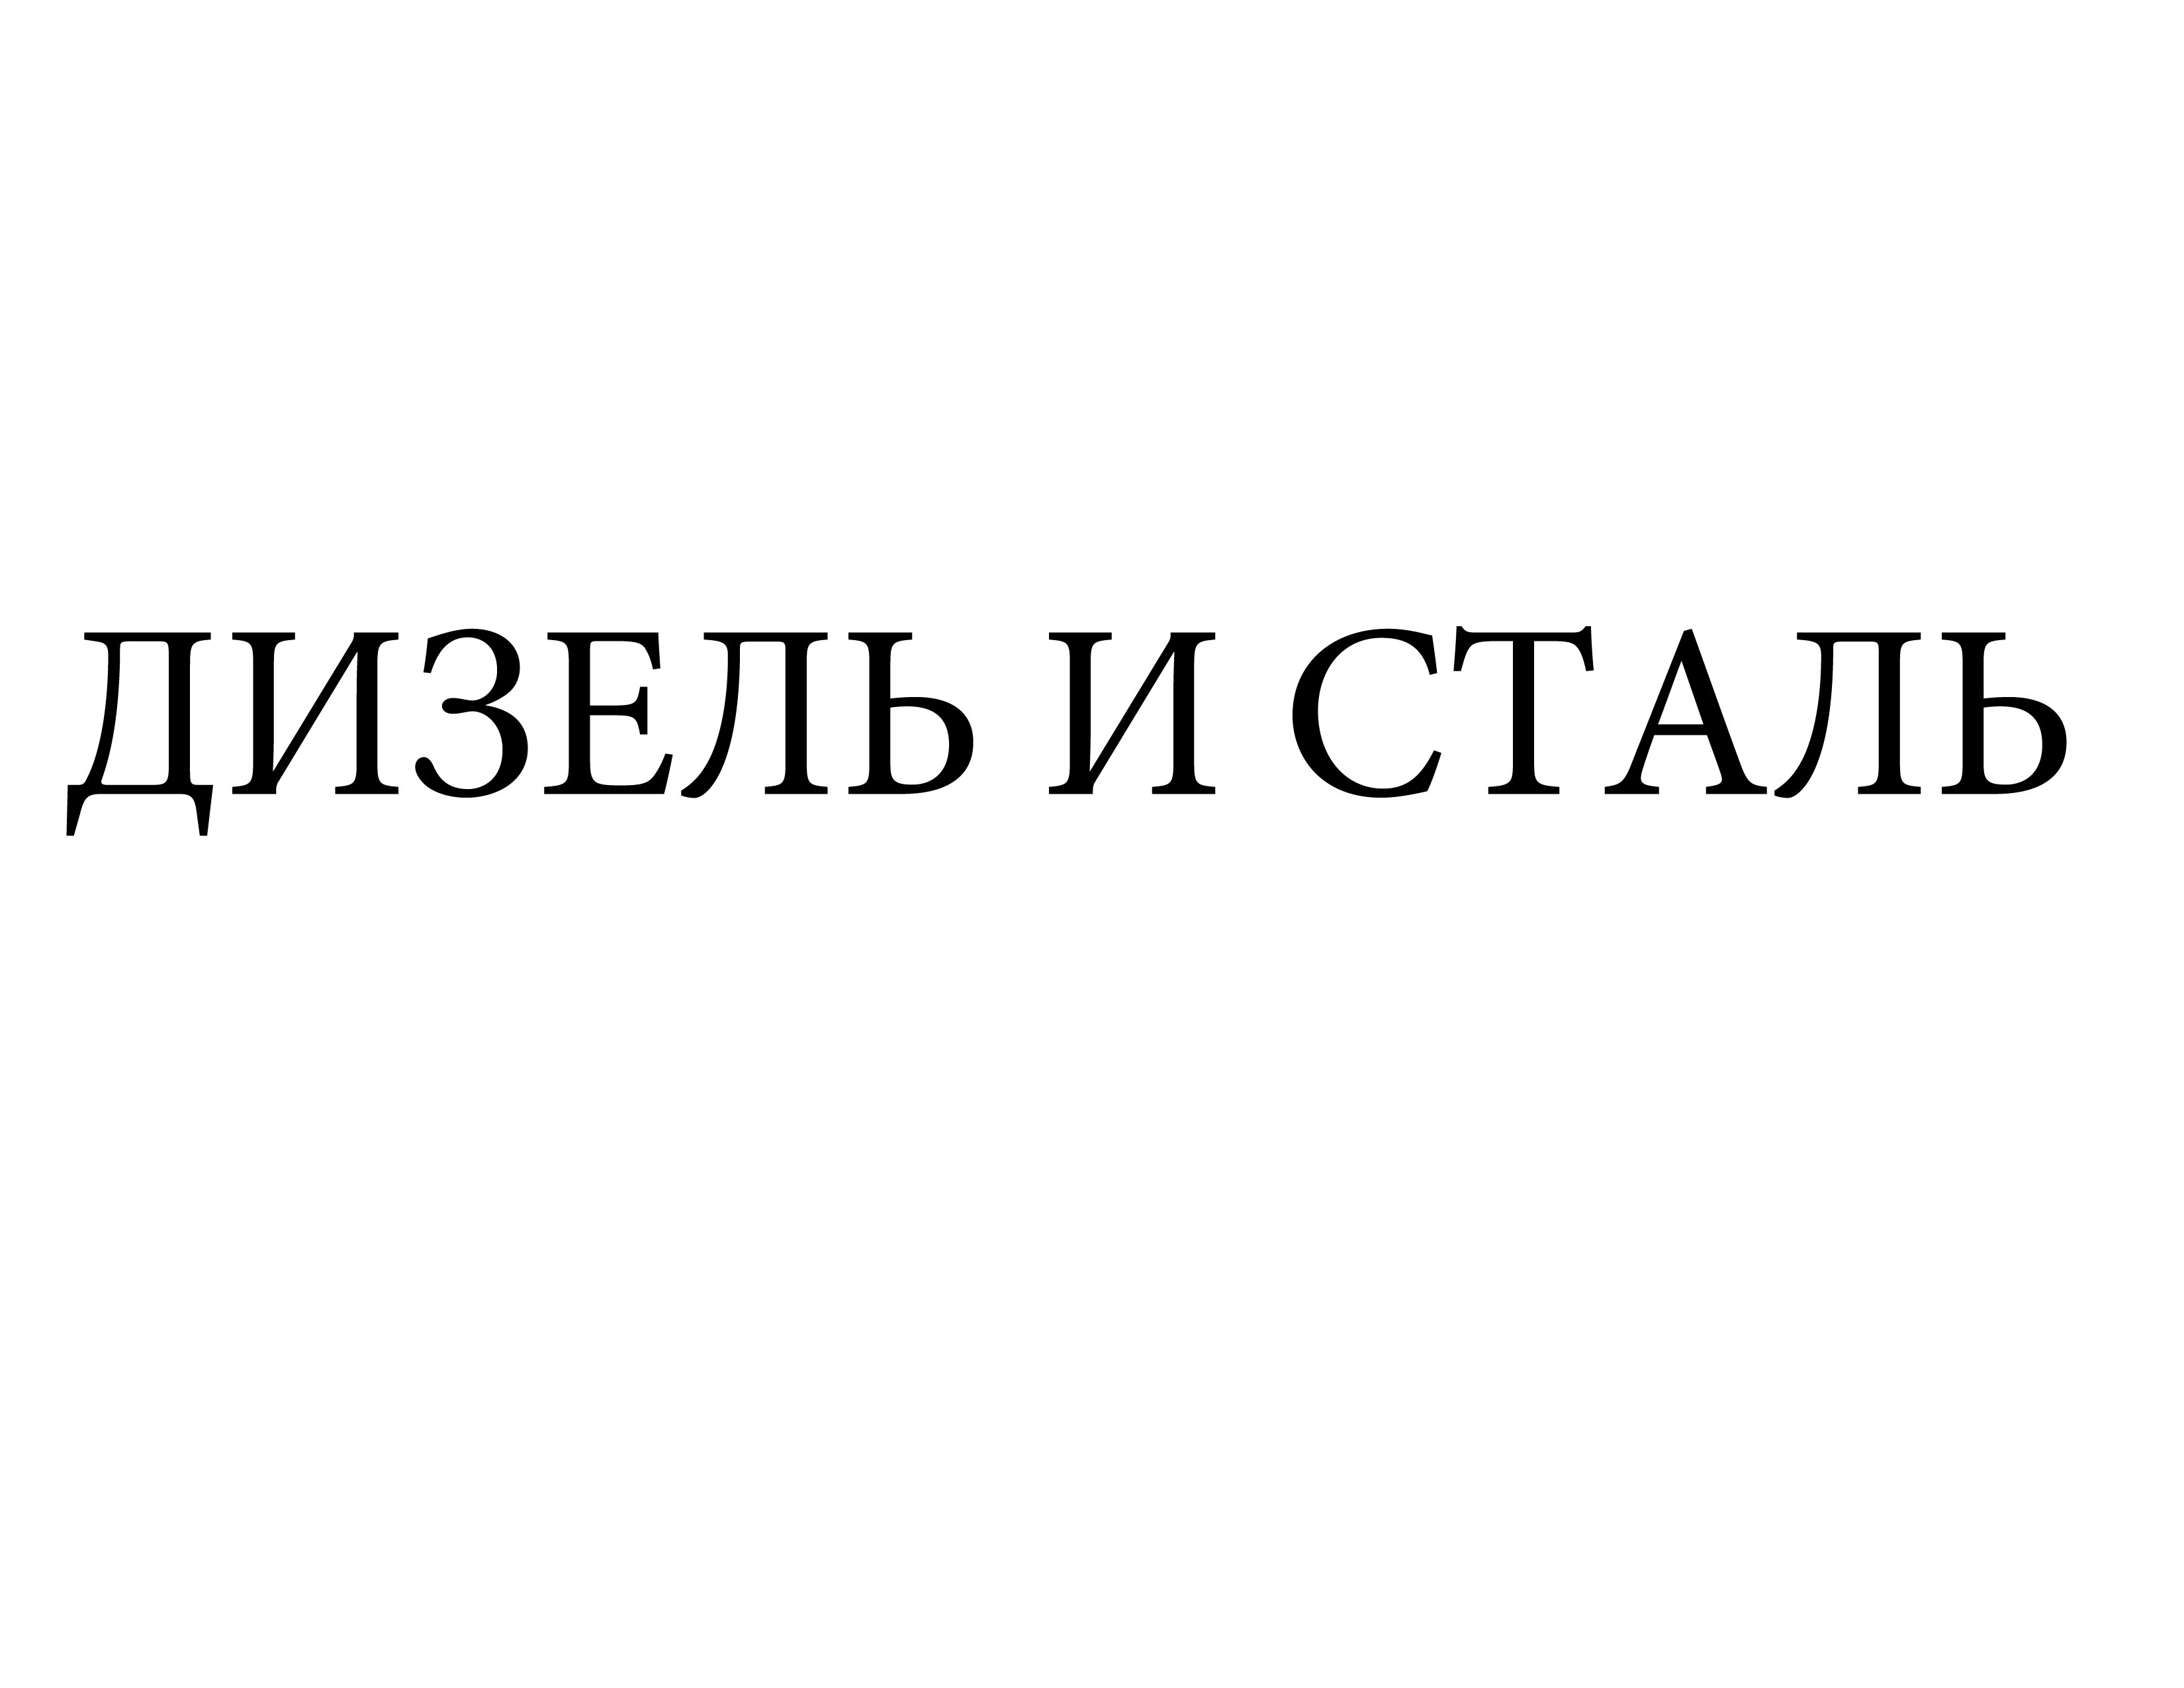 Придумать название автосервису фото f_94755303bf822562.jpg